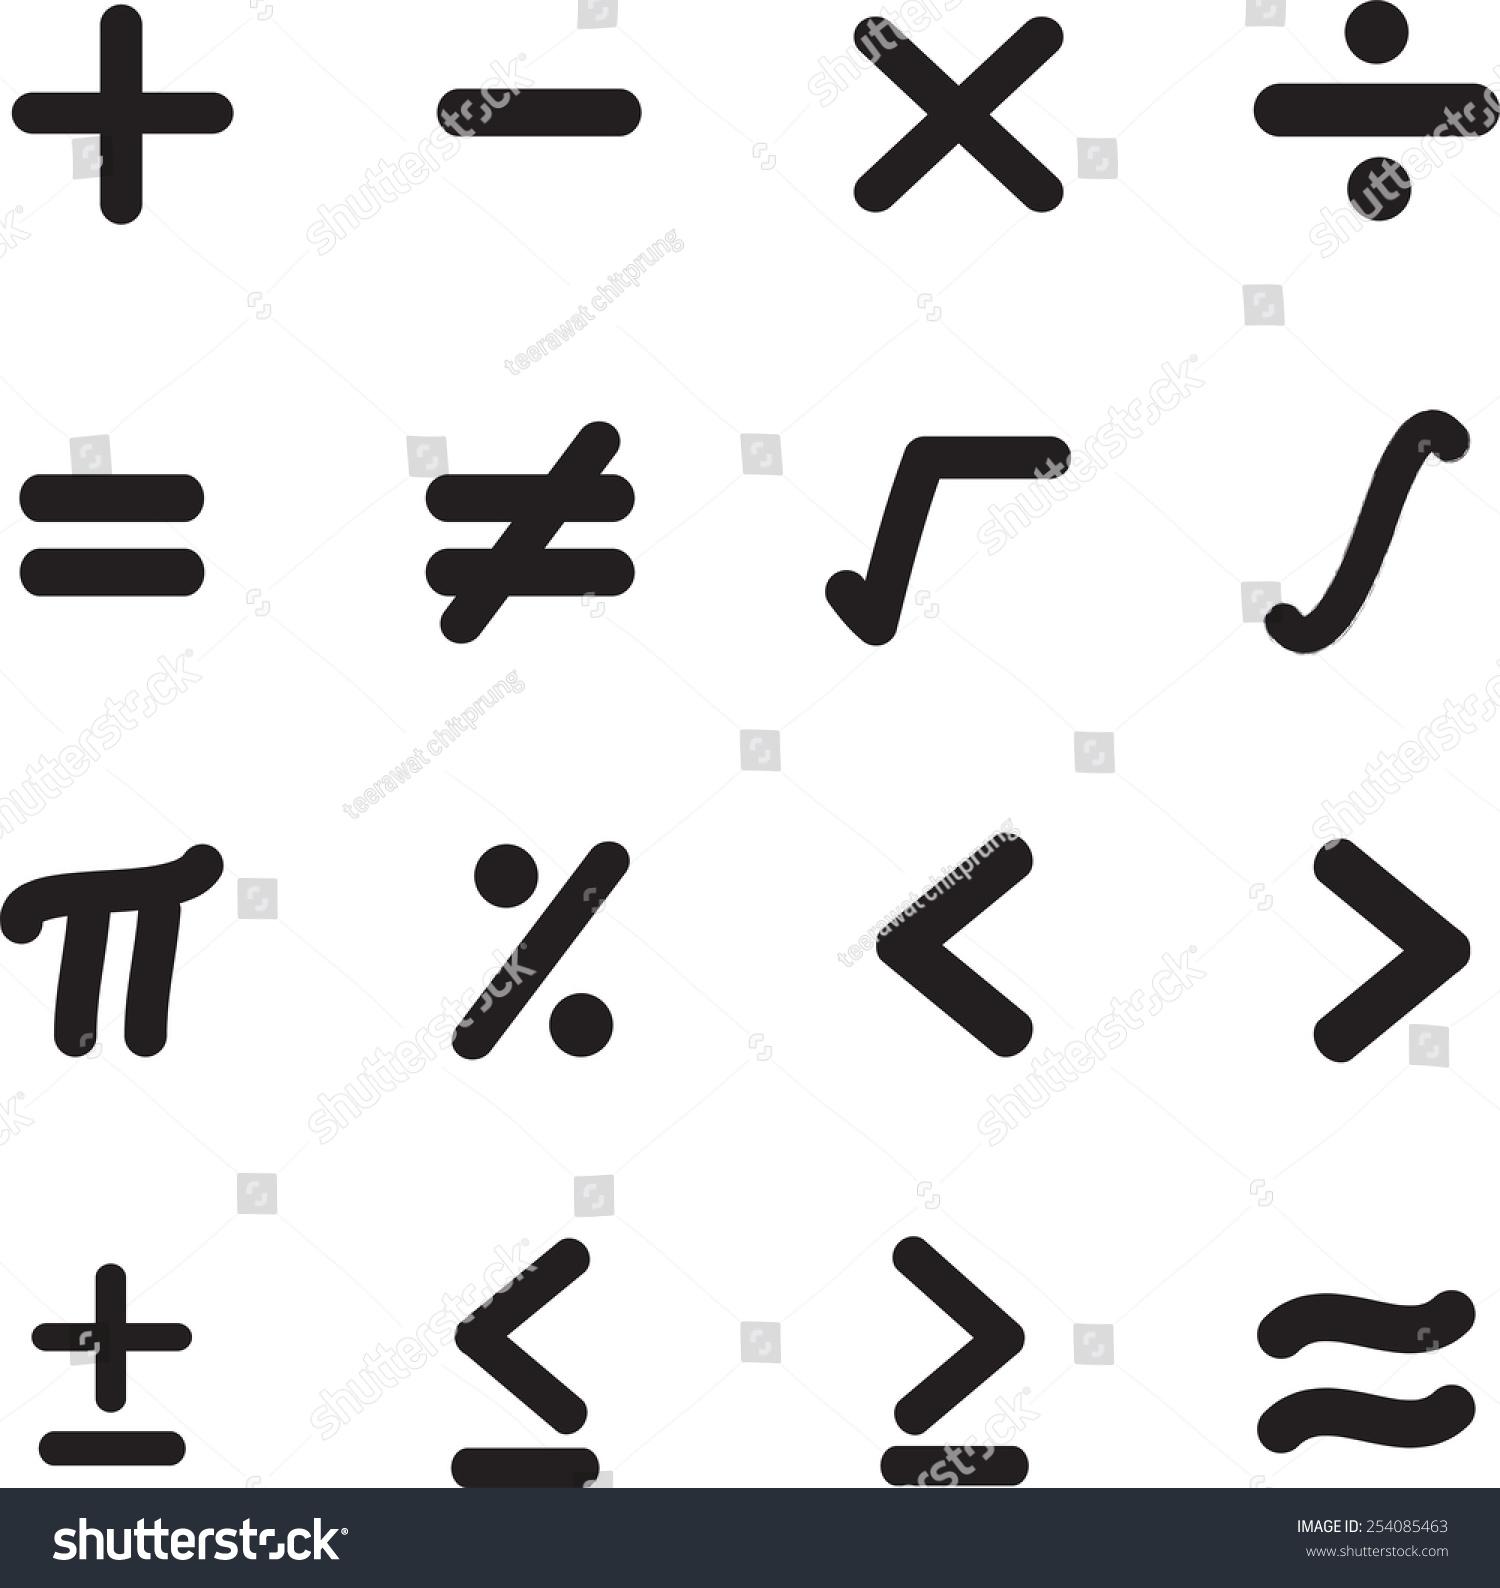 Math symbols set stock vector 254085463 shutterstock math symbols set buycottarizona